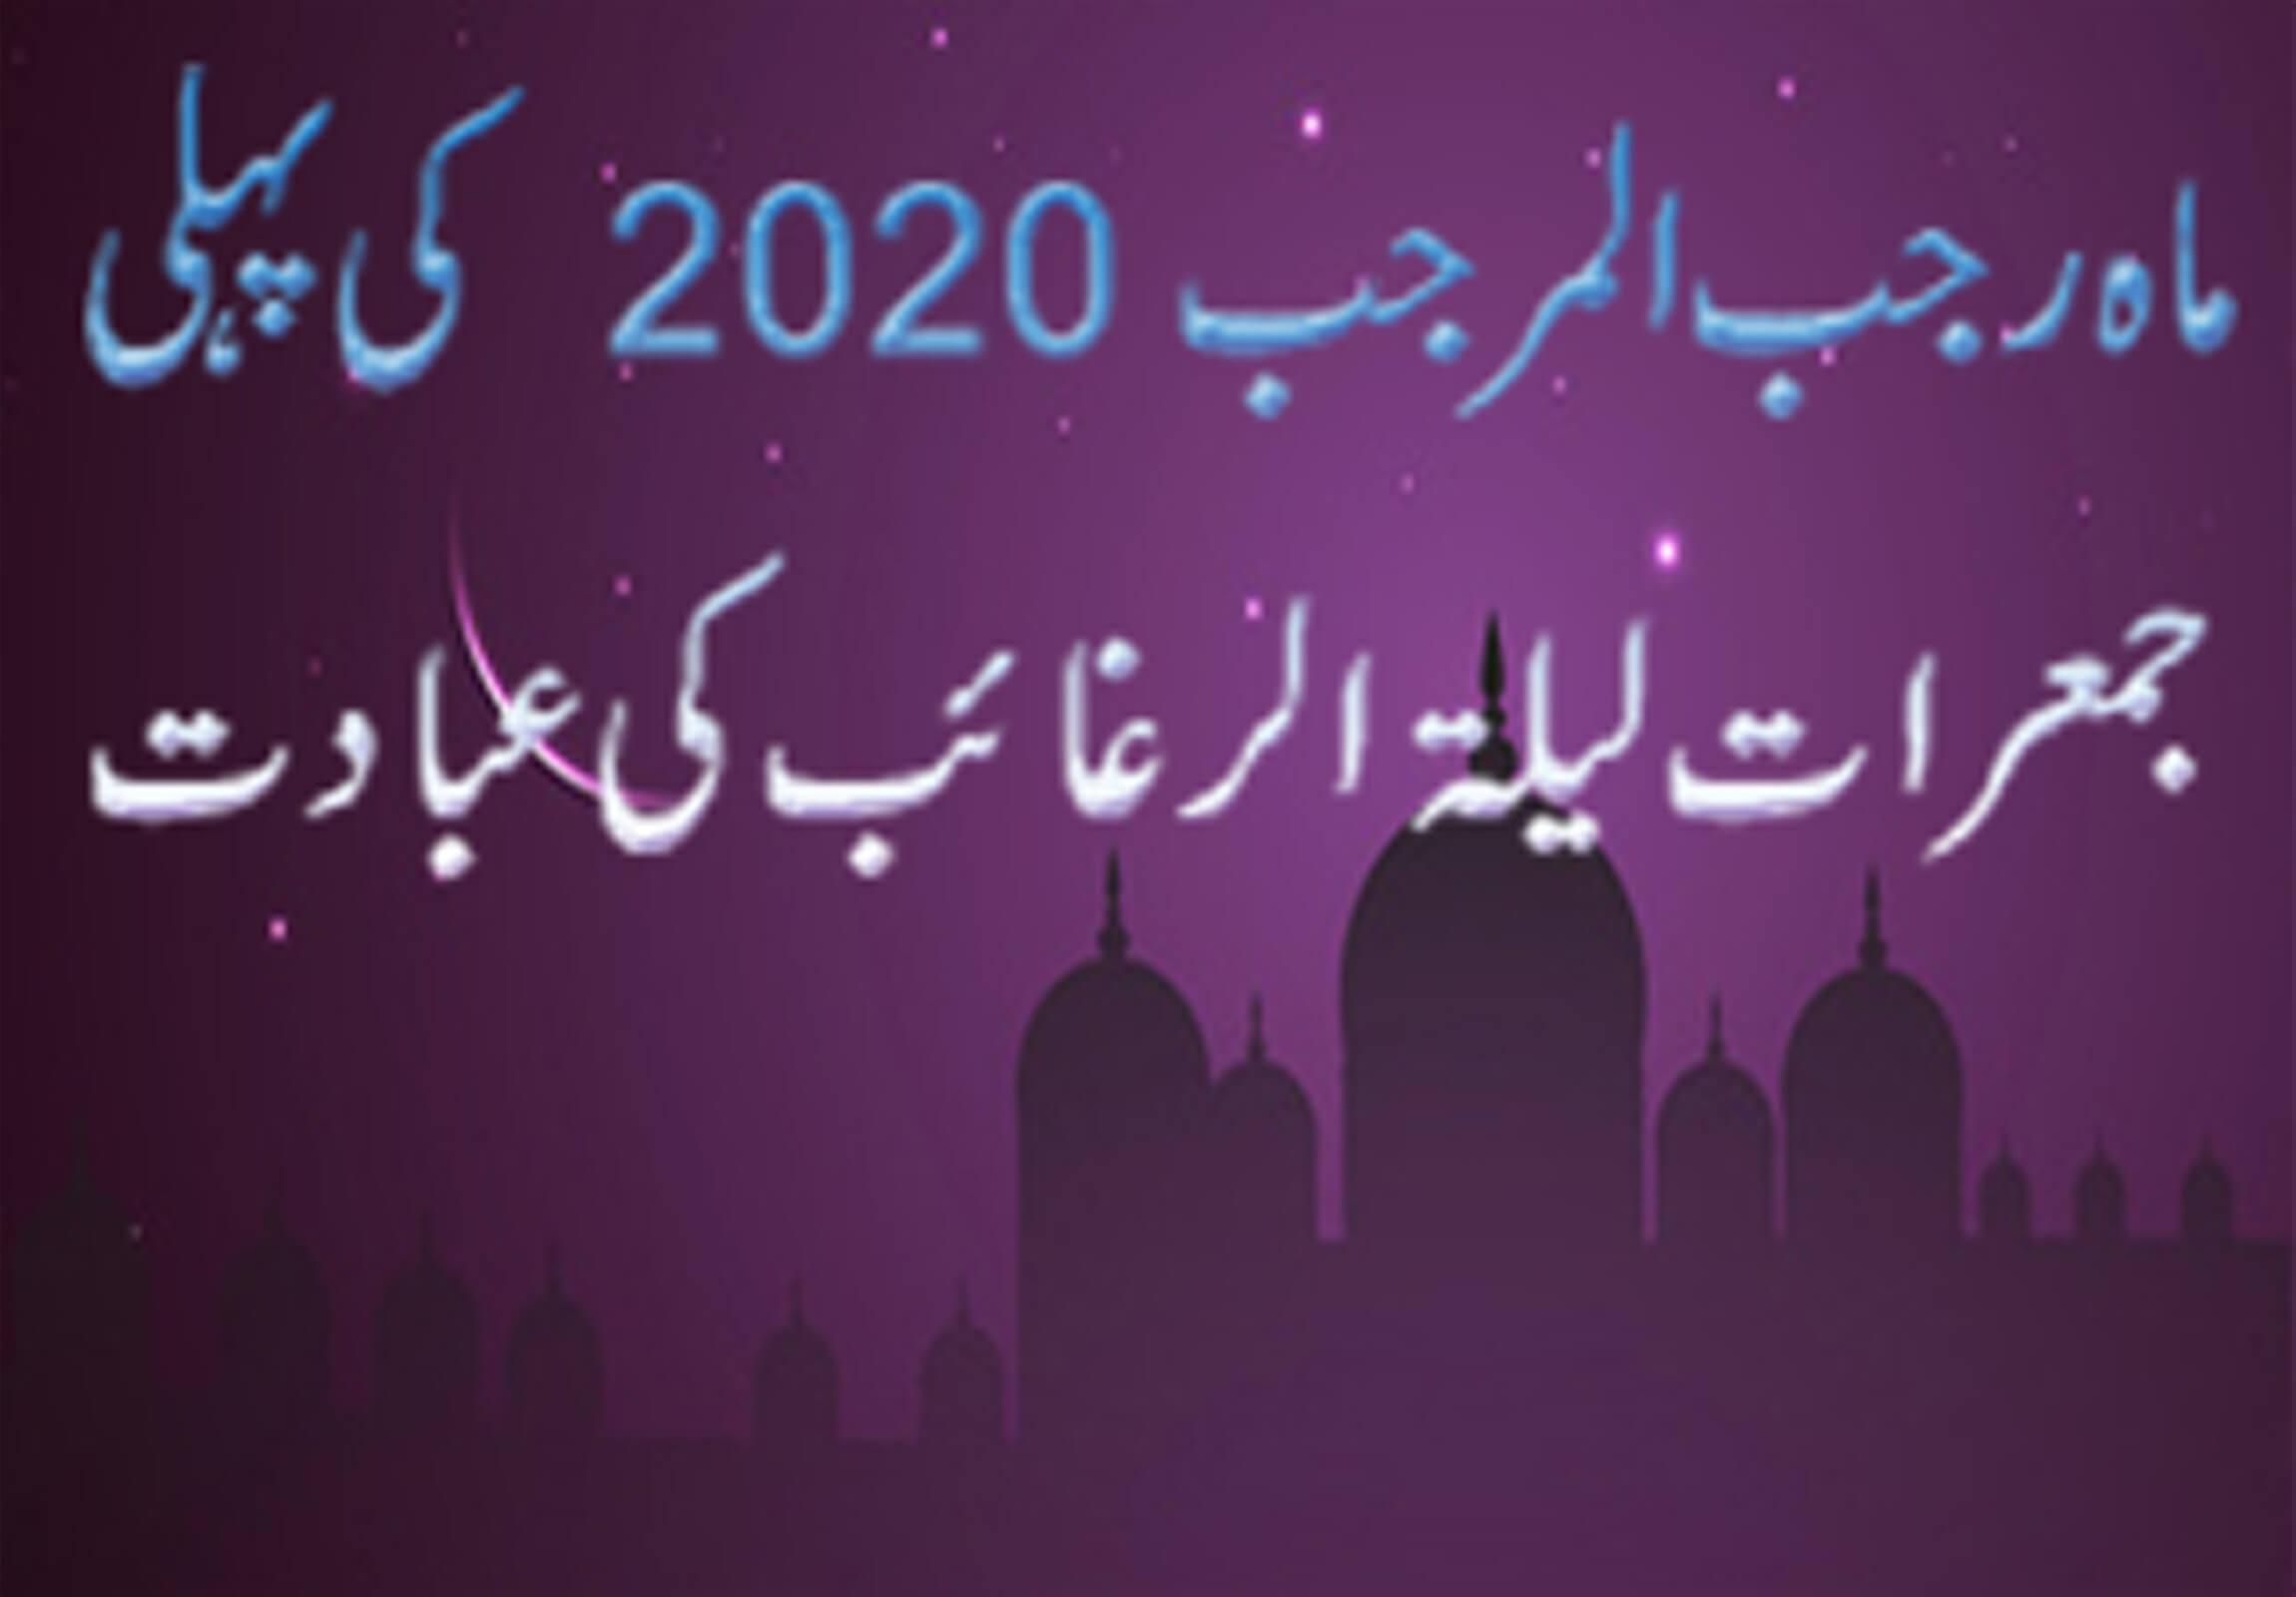 rajab 2020 pehli jumerat ki ibadat